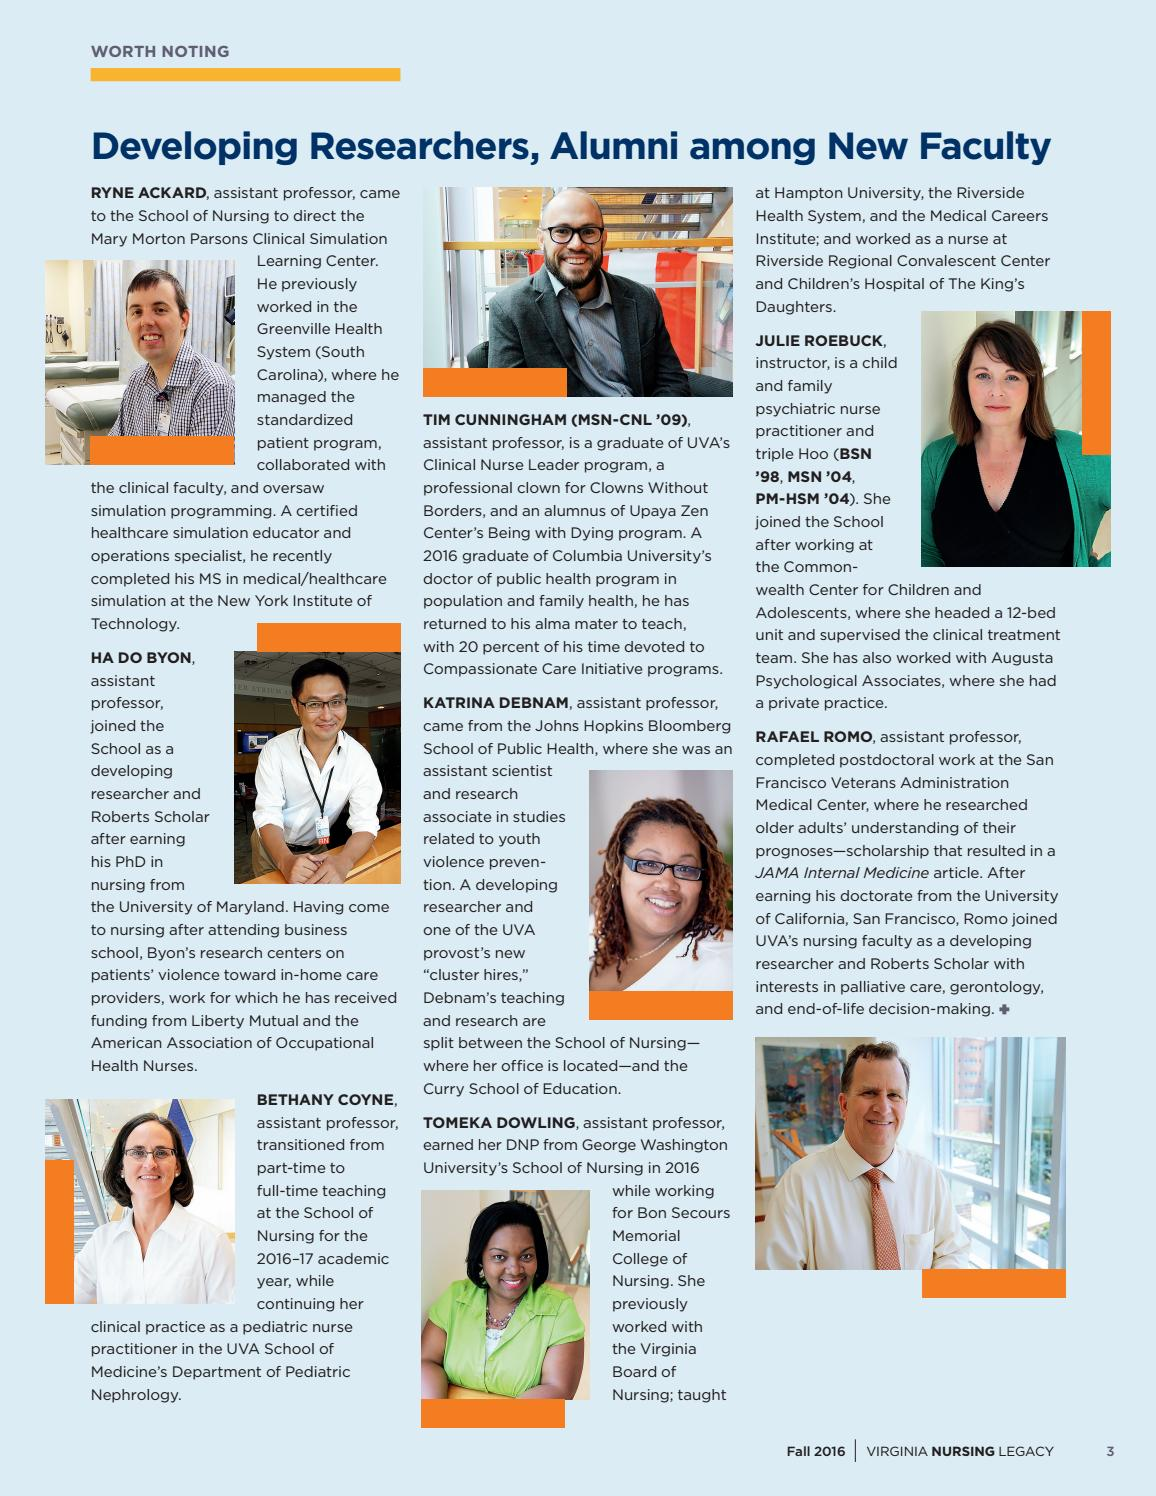 Virginia Nursing Legacy Fall 2016 by Virginia Nursing Legacy